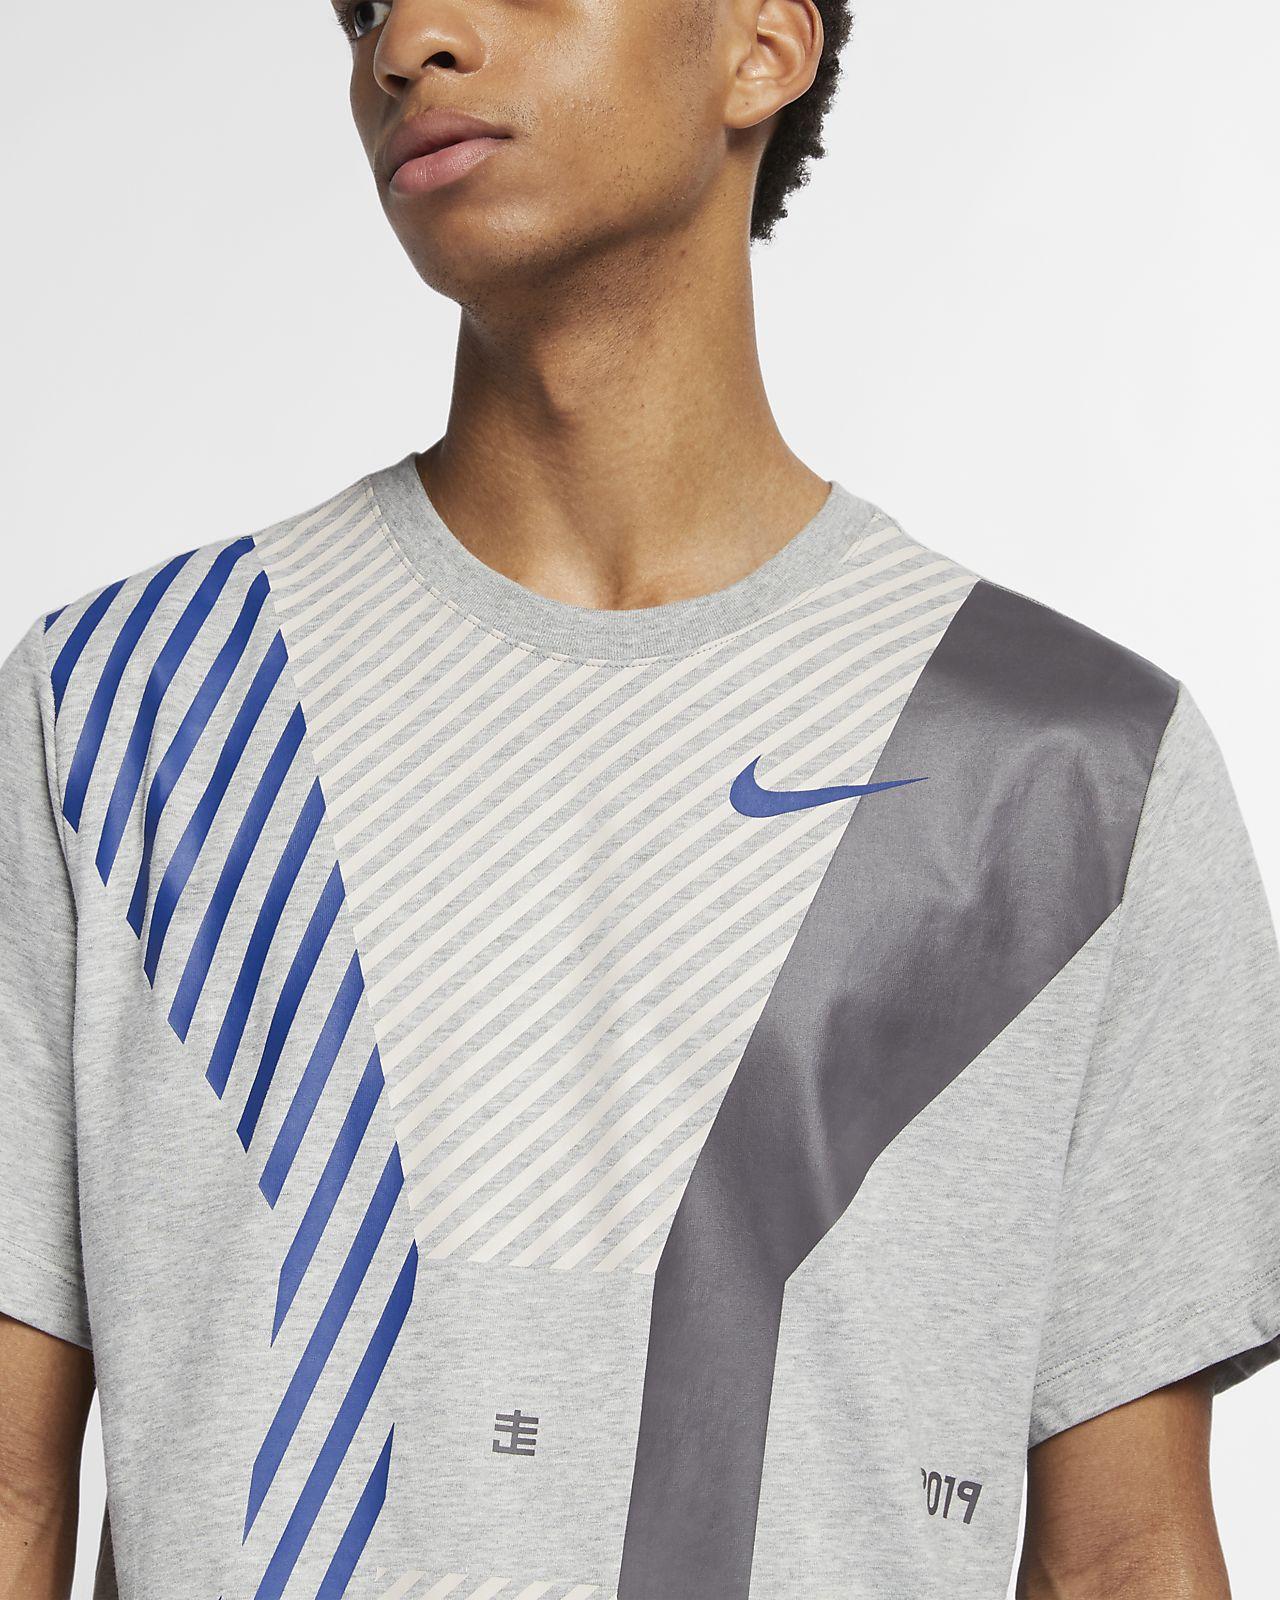 561d49f4ab17c Nike Dri-FIT Men's Running T-Shirt. Nike.com NO